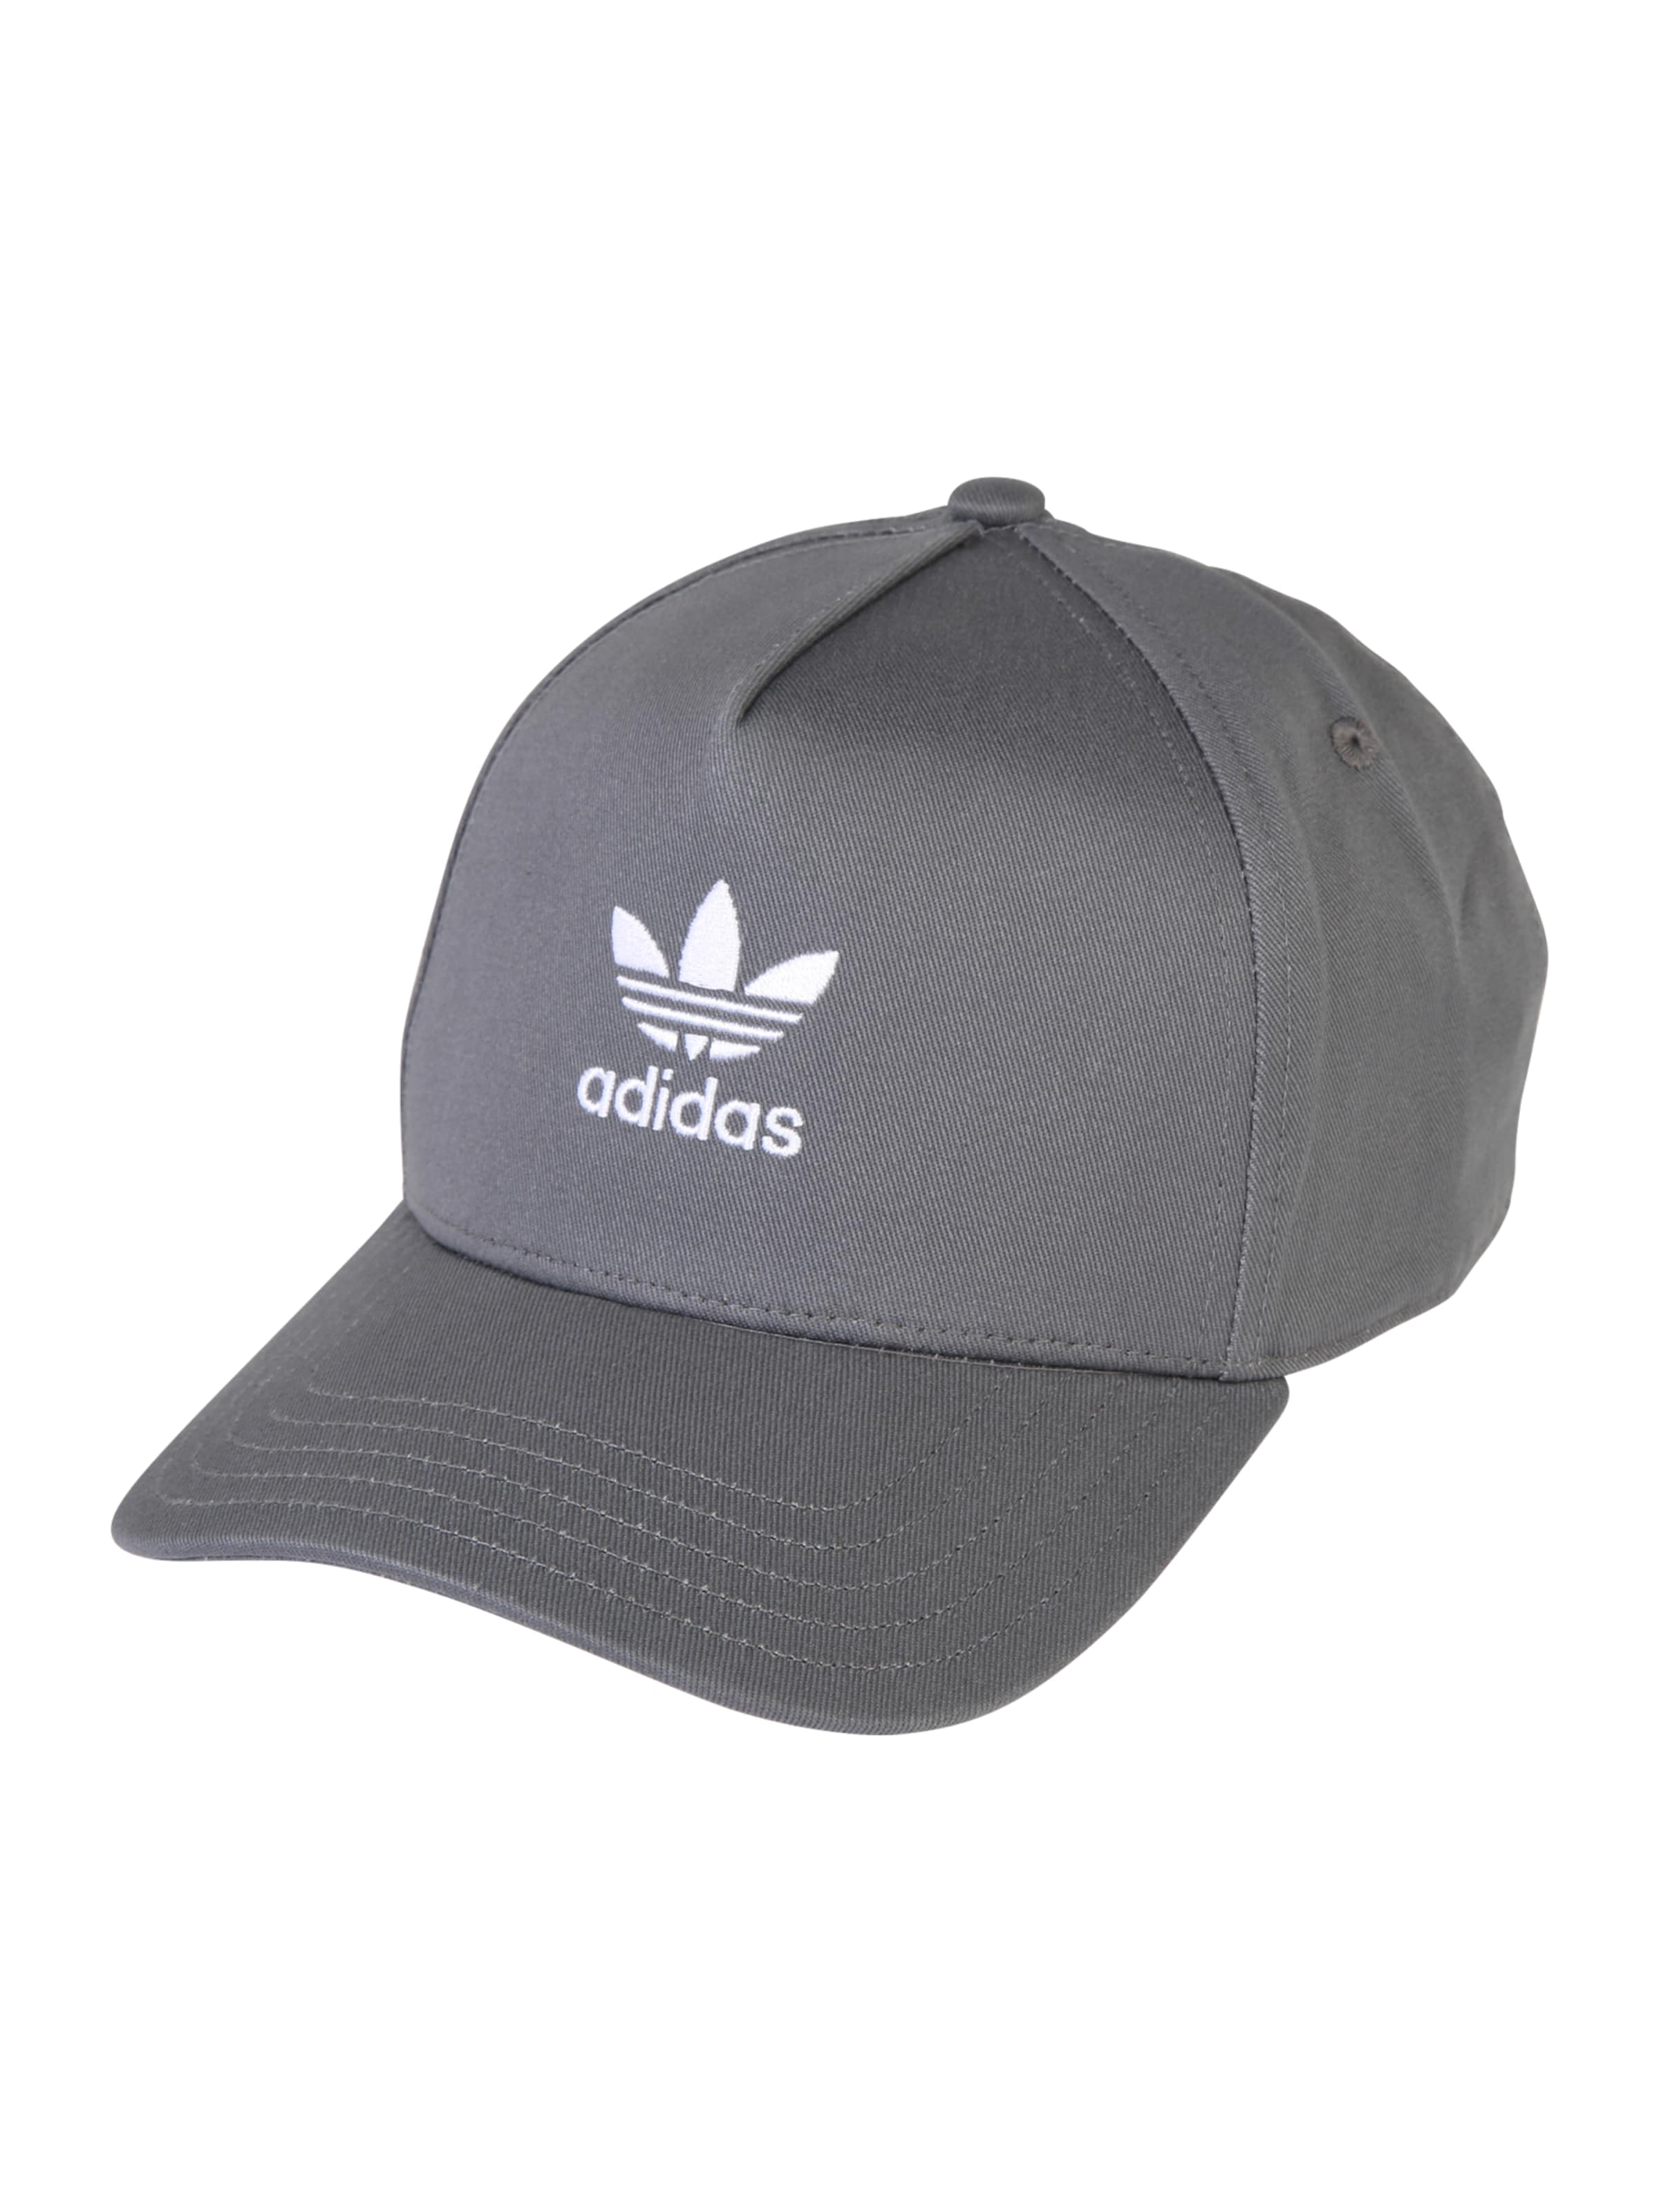 Adidas Grau Cap Clsd 'ac Trk Originals In Crv' uJ5c3KTlF1